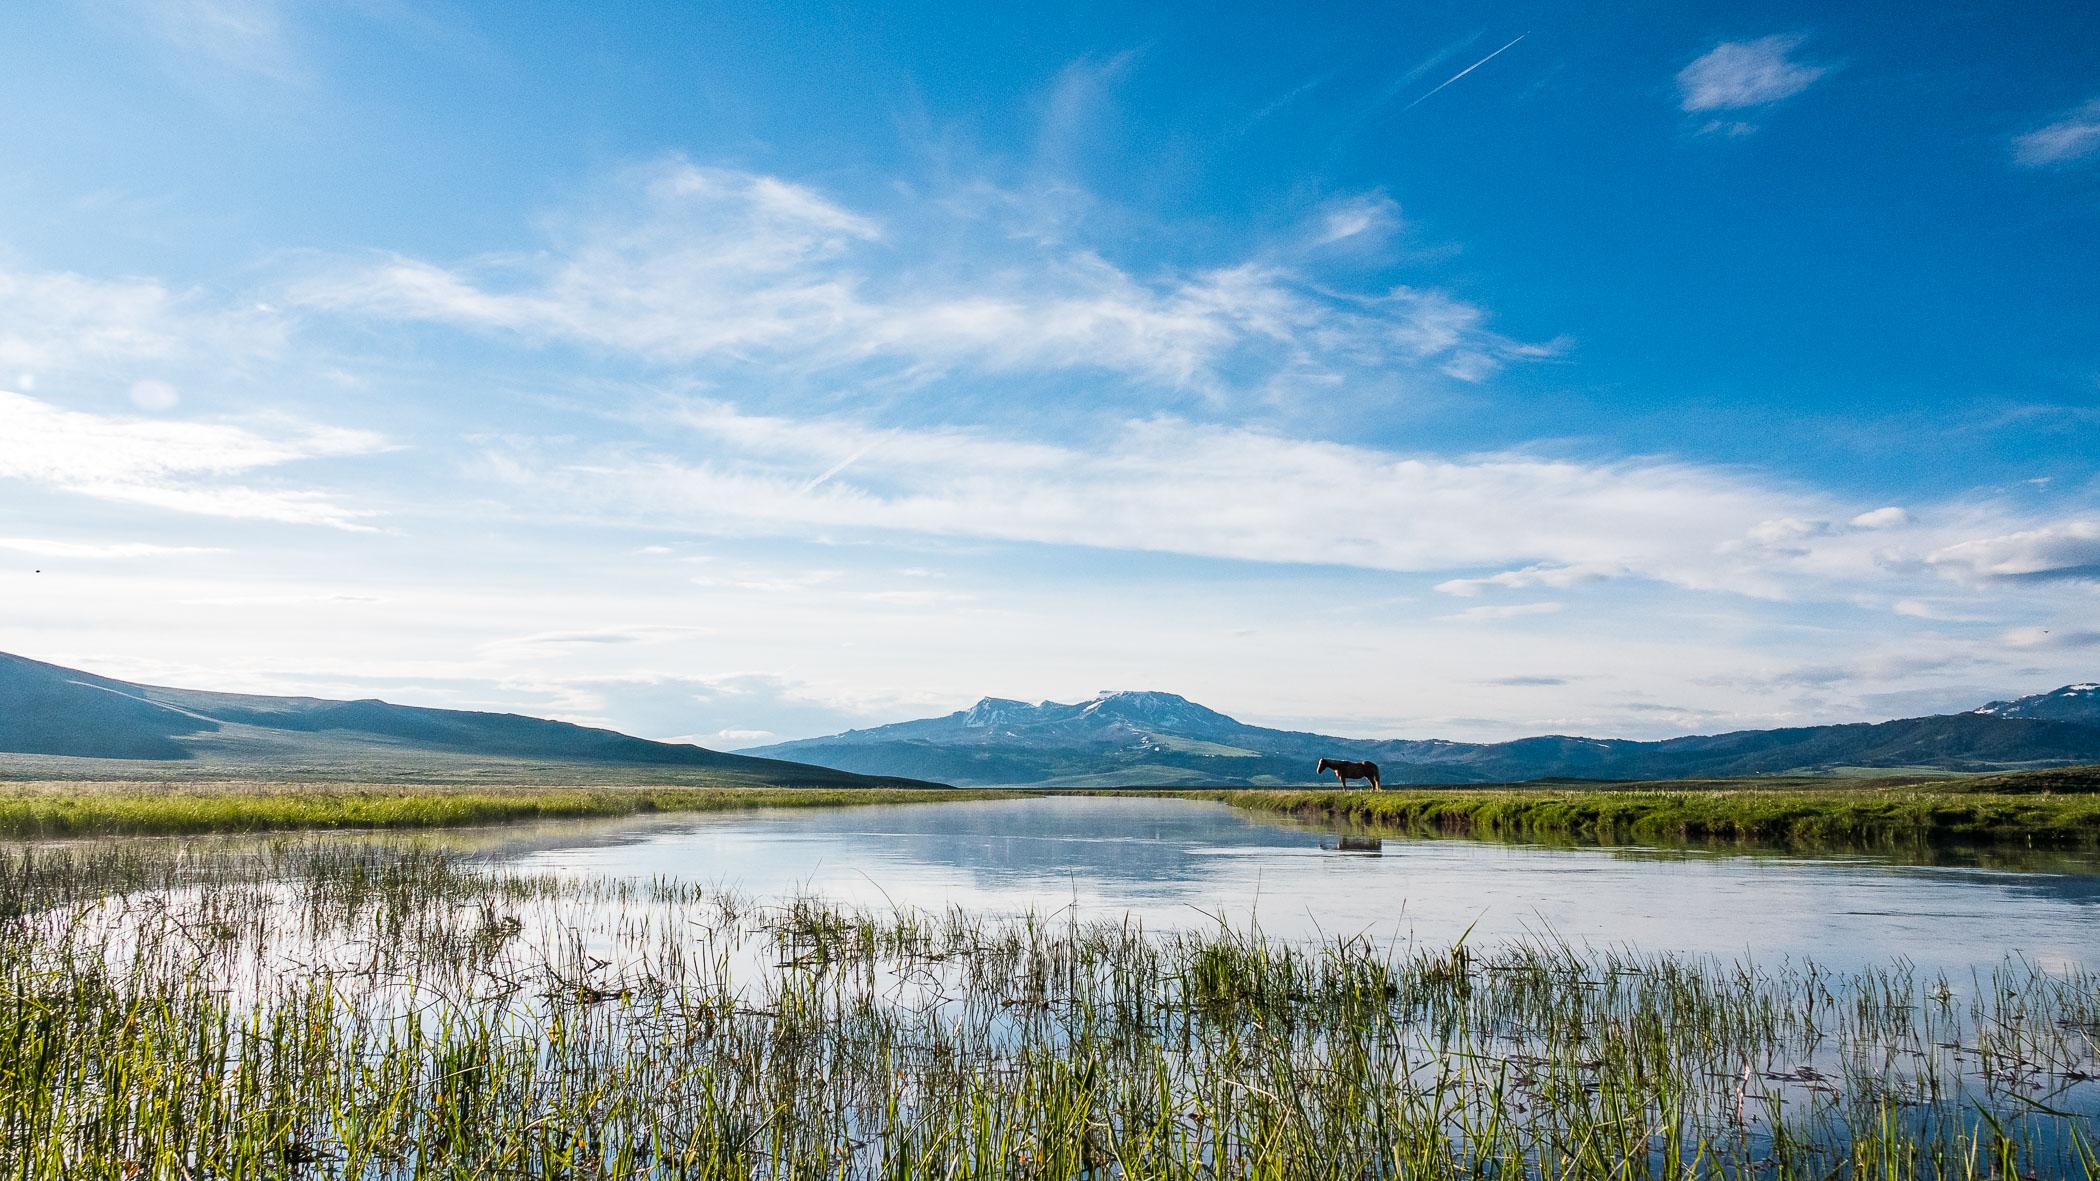 horse-centennial-valley-montana-usa-landscape-photographer-jesper-anhede-01071-sony-rx10